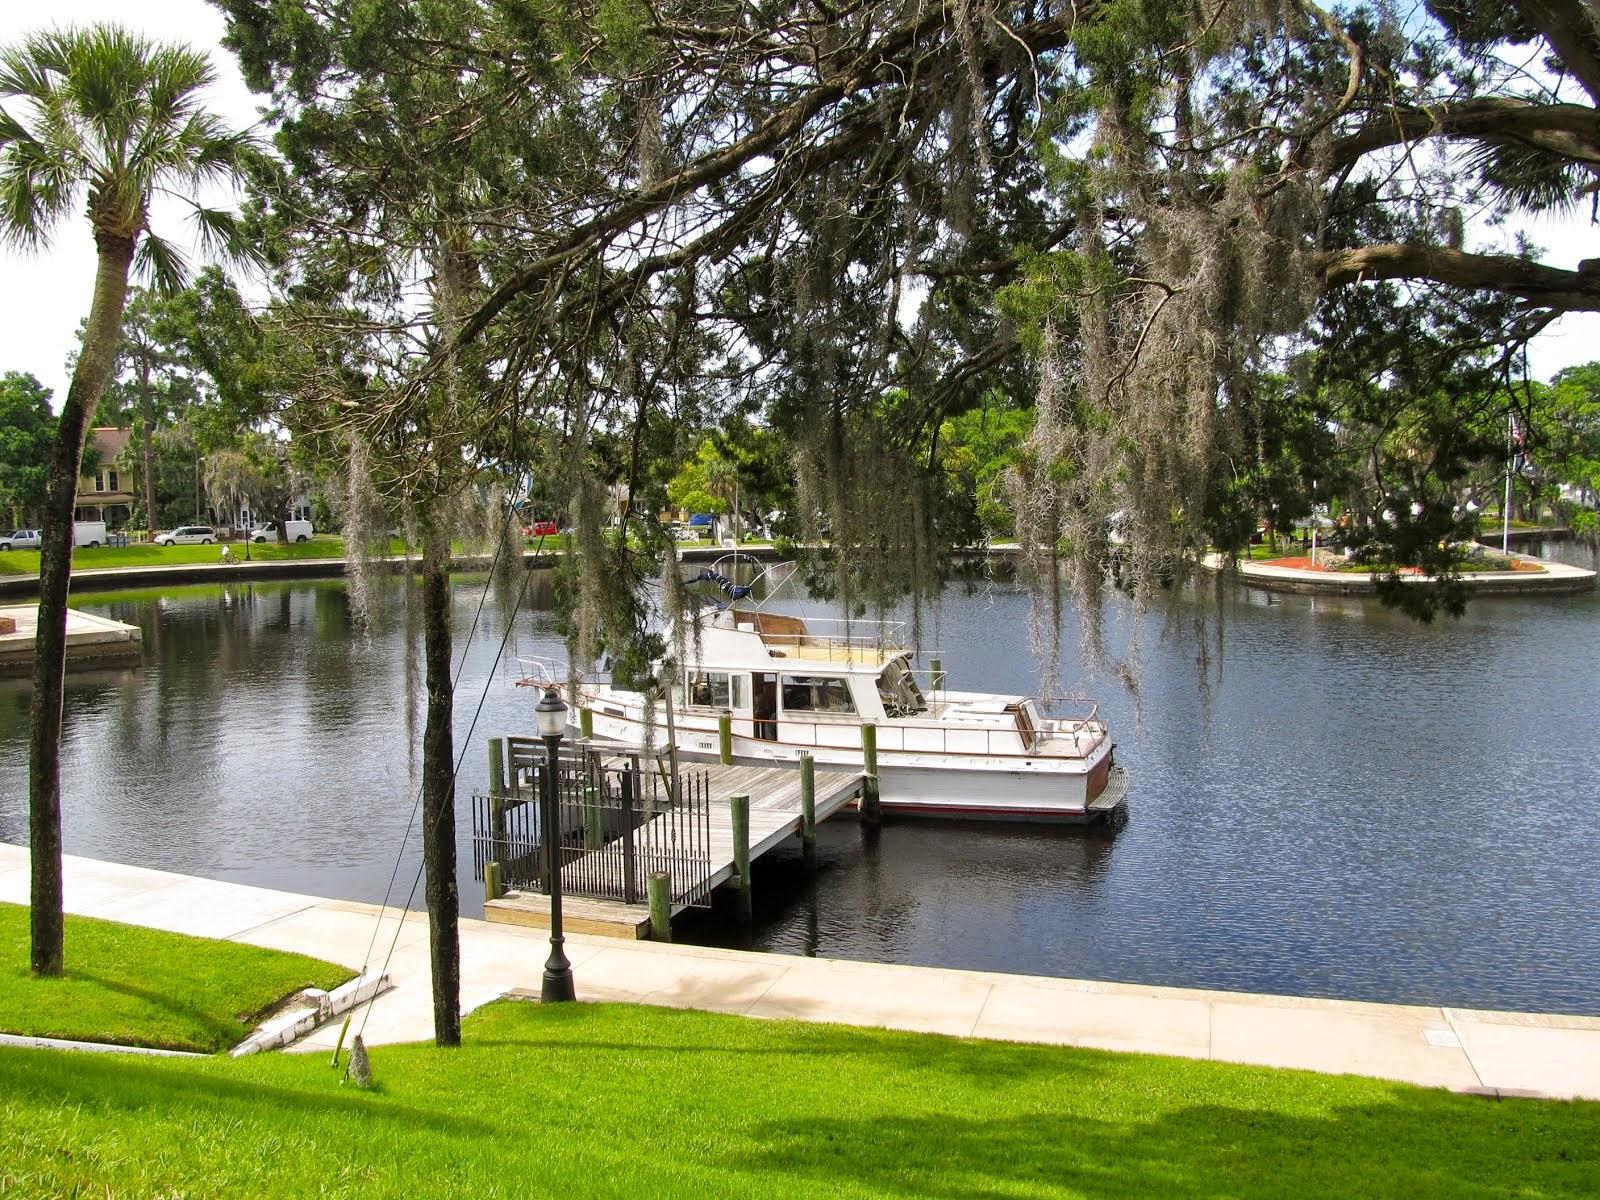 A Serene Scene at Spring Bayou